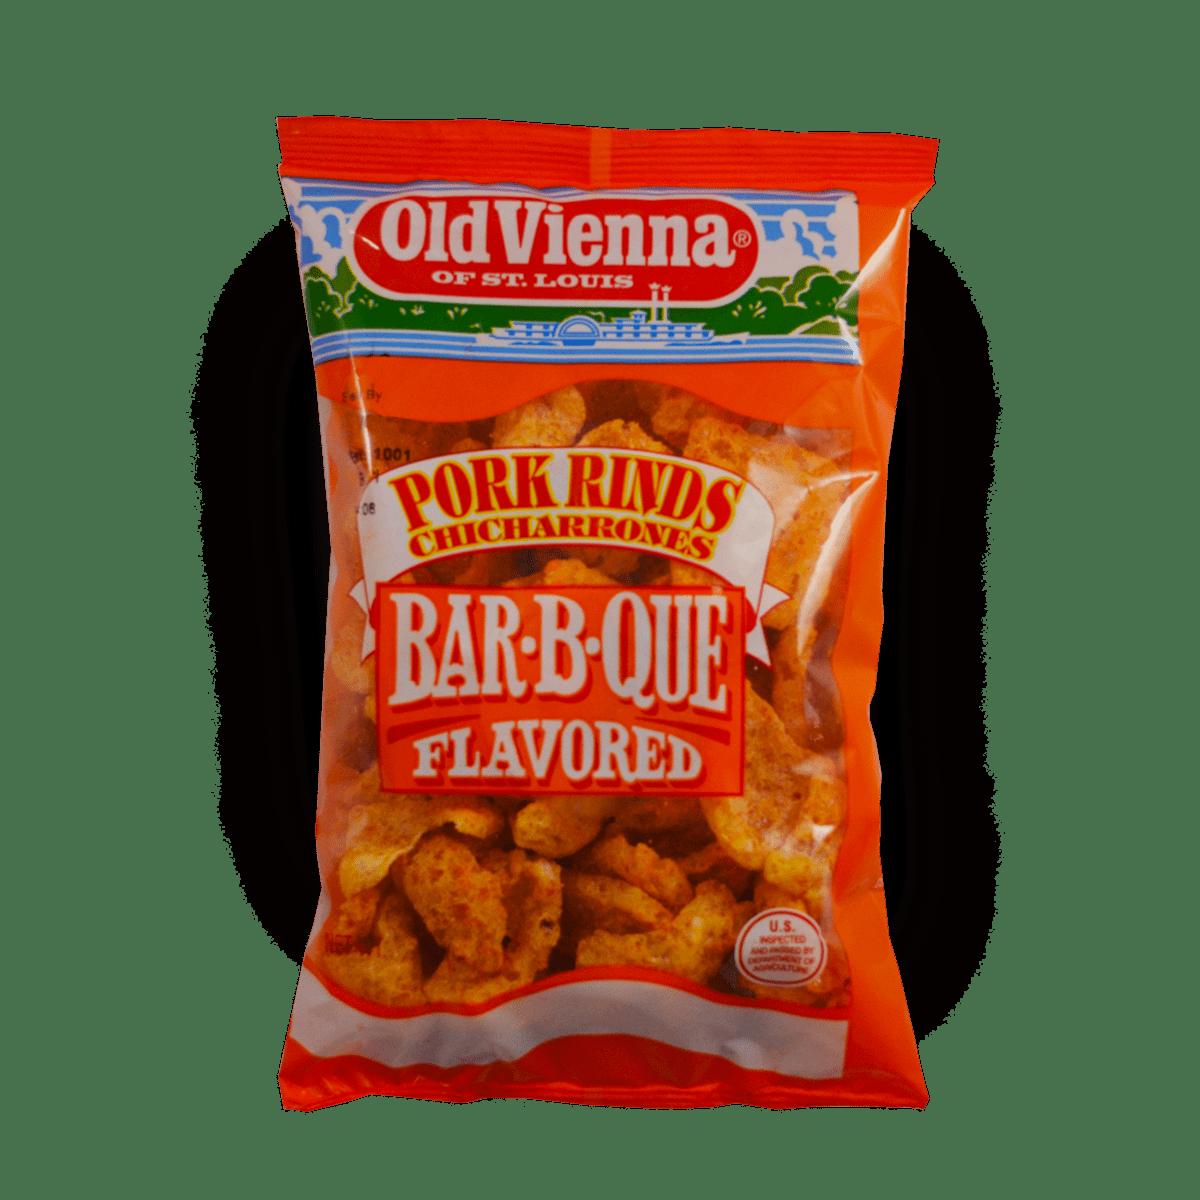 Old Vienna Barbecue Flavored Pork Rinds Chicharrones